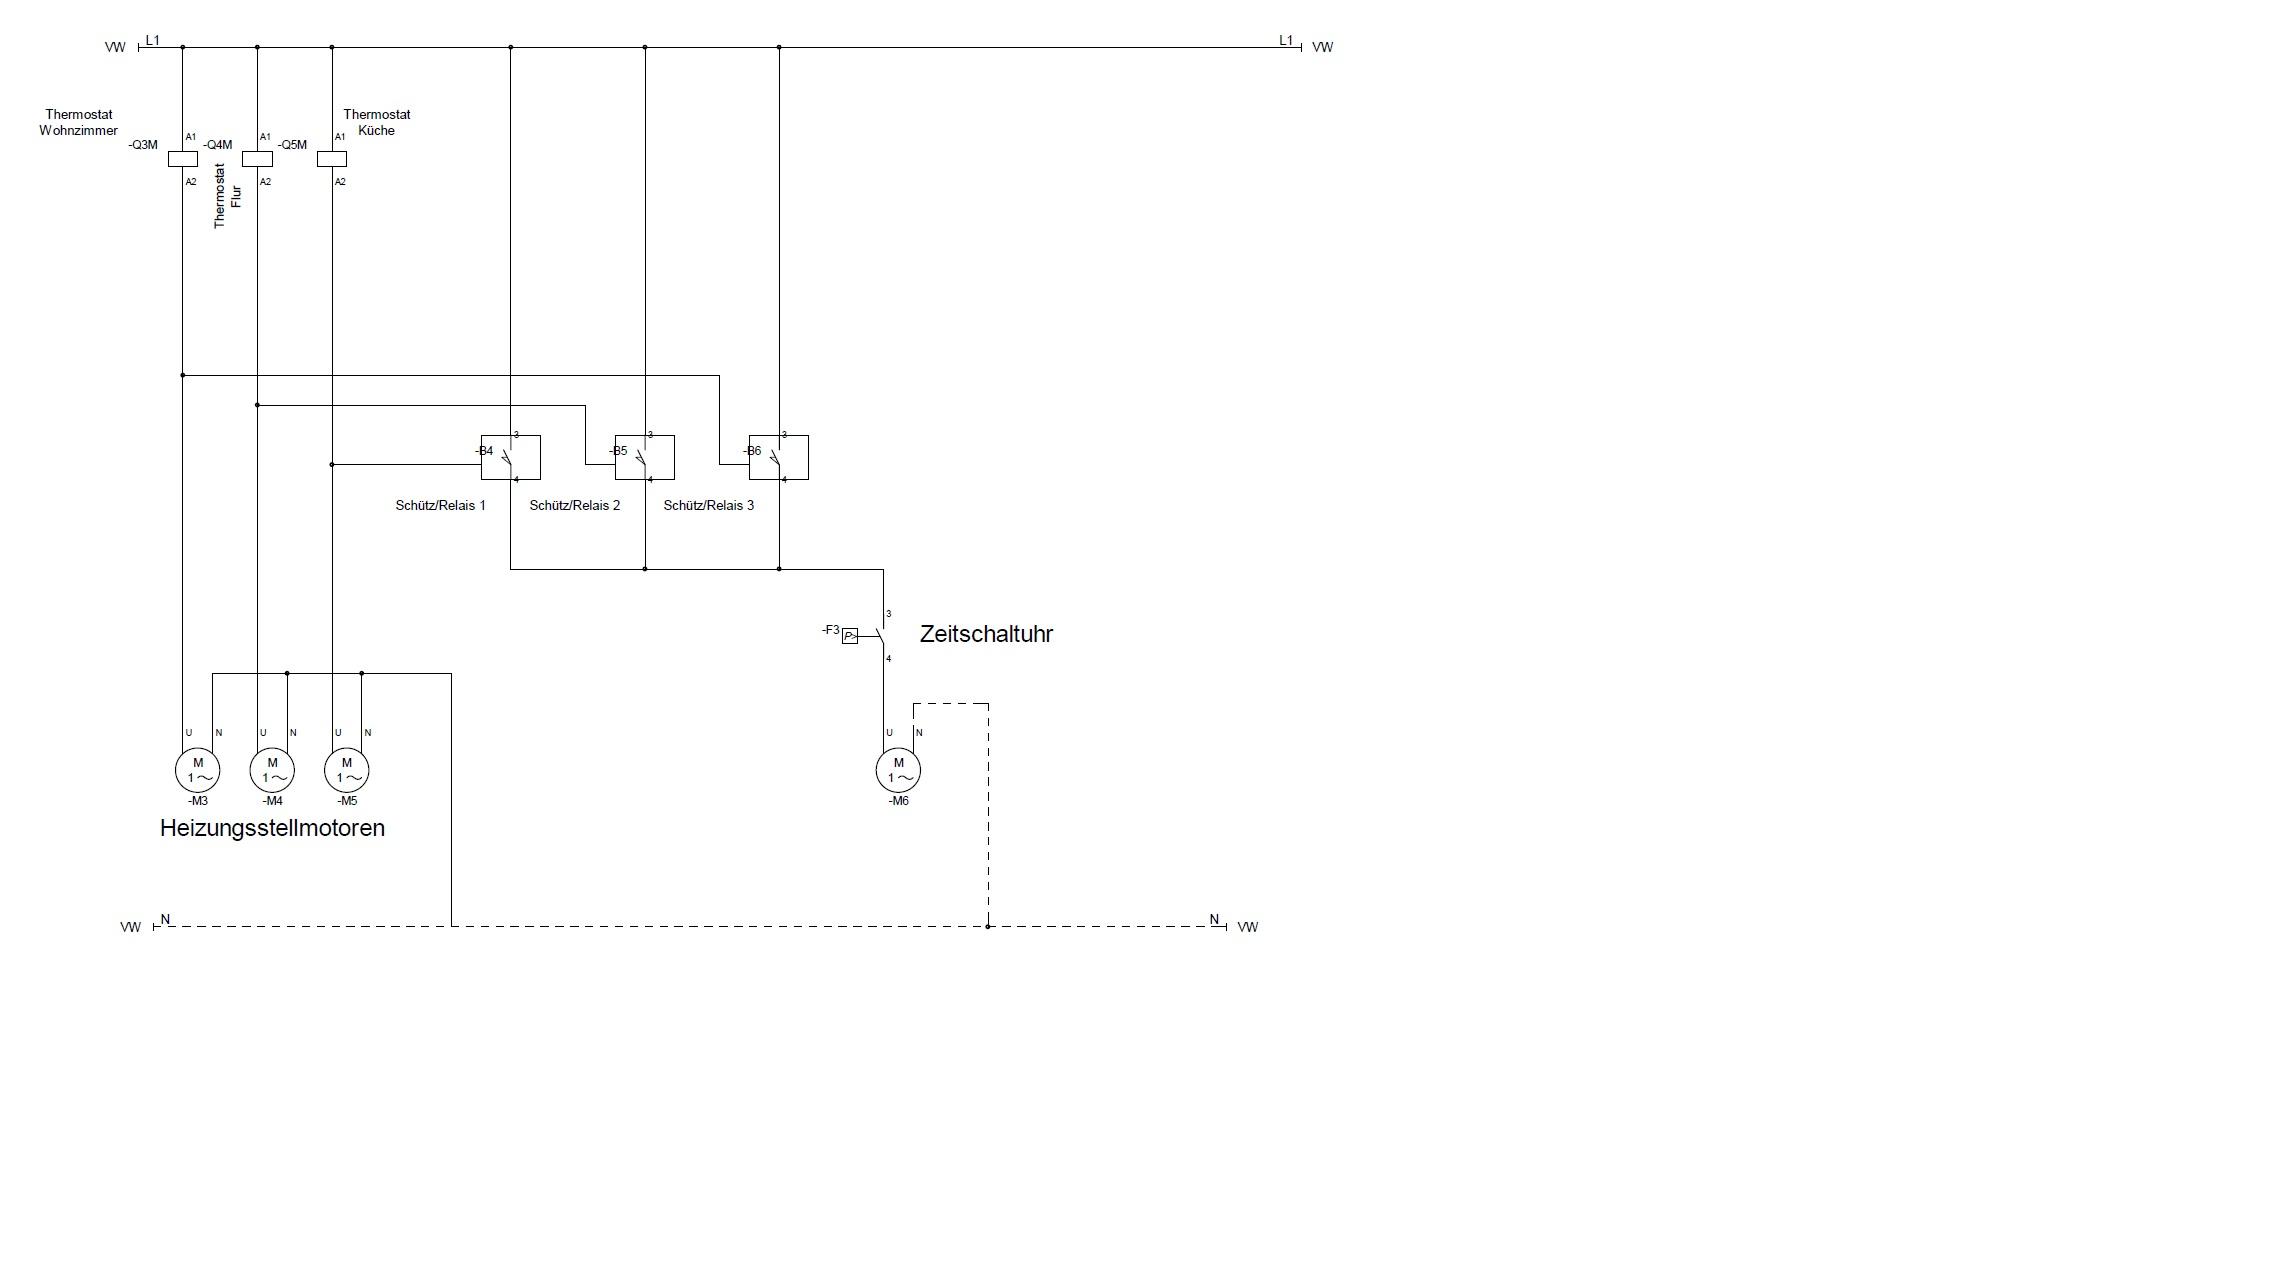 inteligente schaltung einer umw lzpumpe ber sch tz oder relais. Black Bedroom Furniture Sets. Home Design Ideas